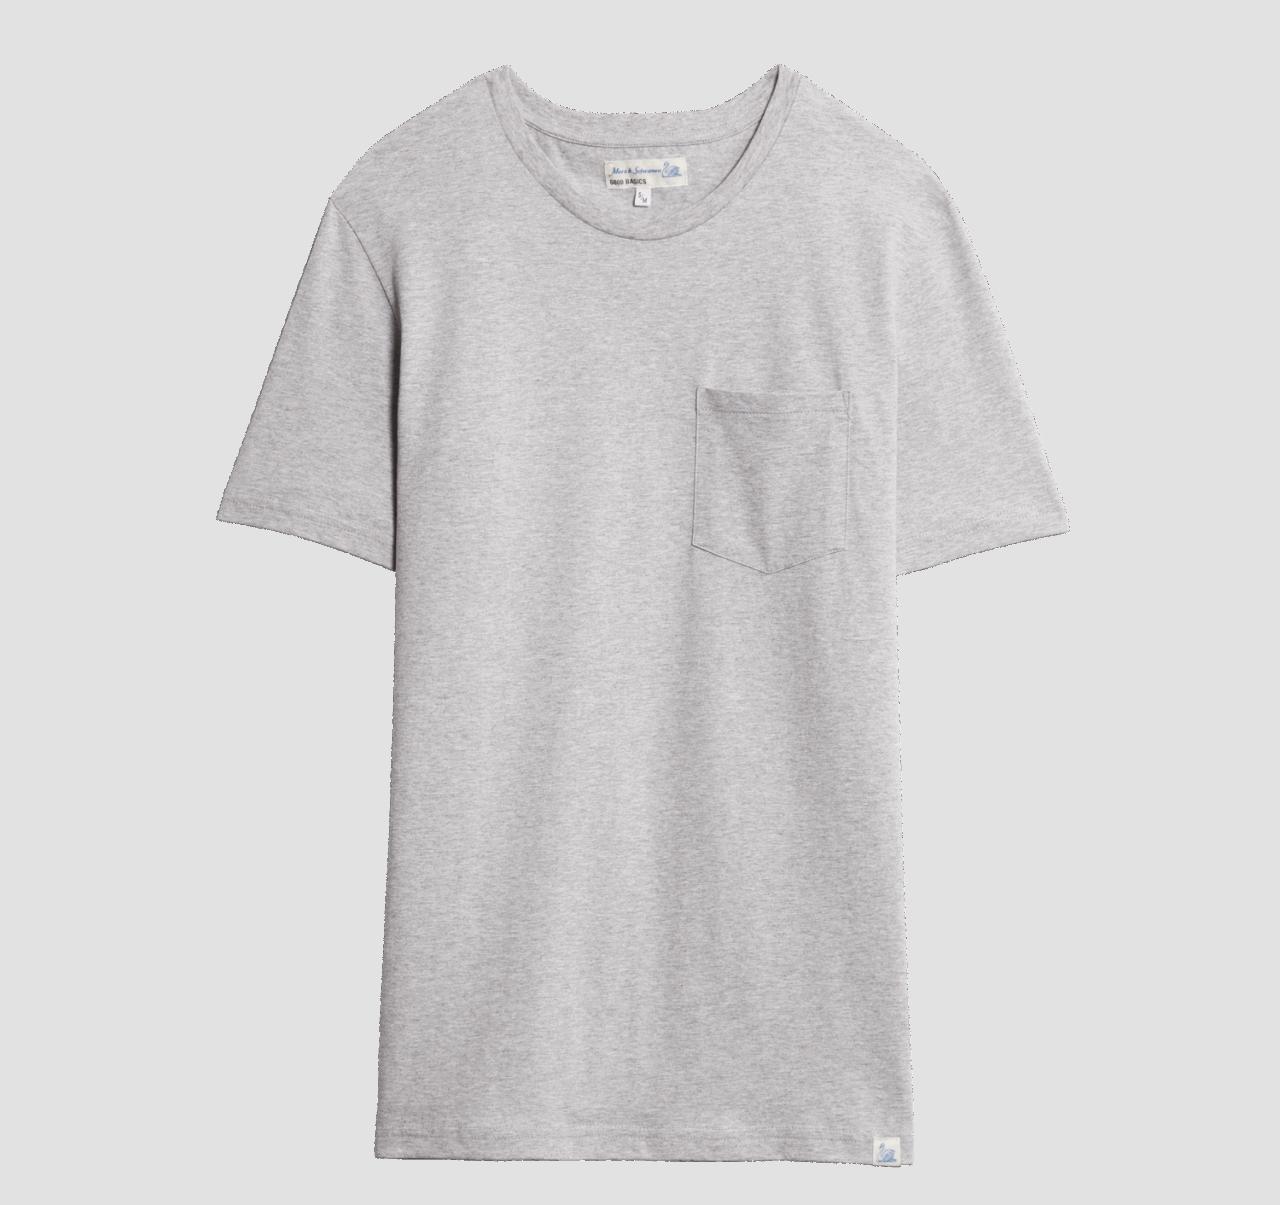 Merz b. Schwanen Basic Pocket T-Shirt - Grey Mel.